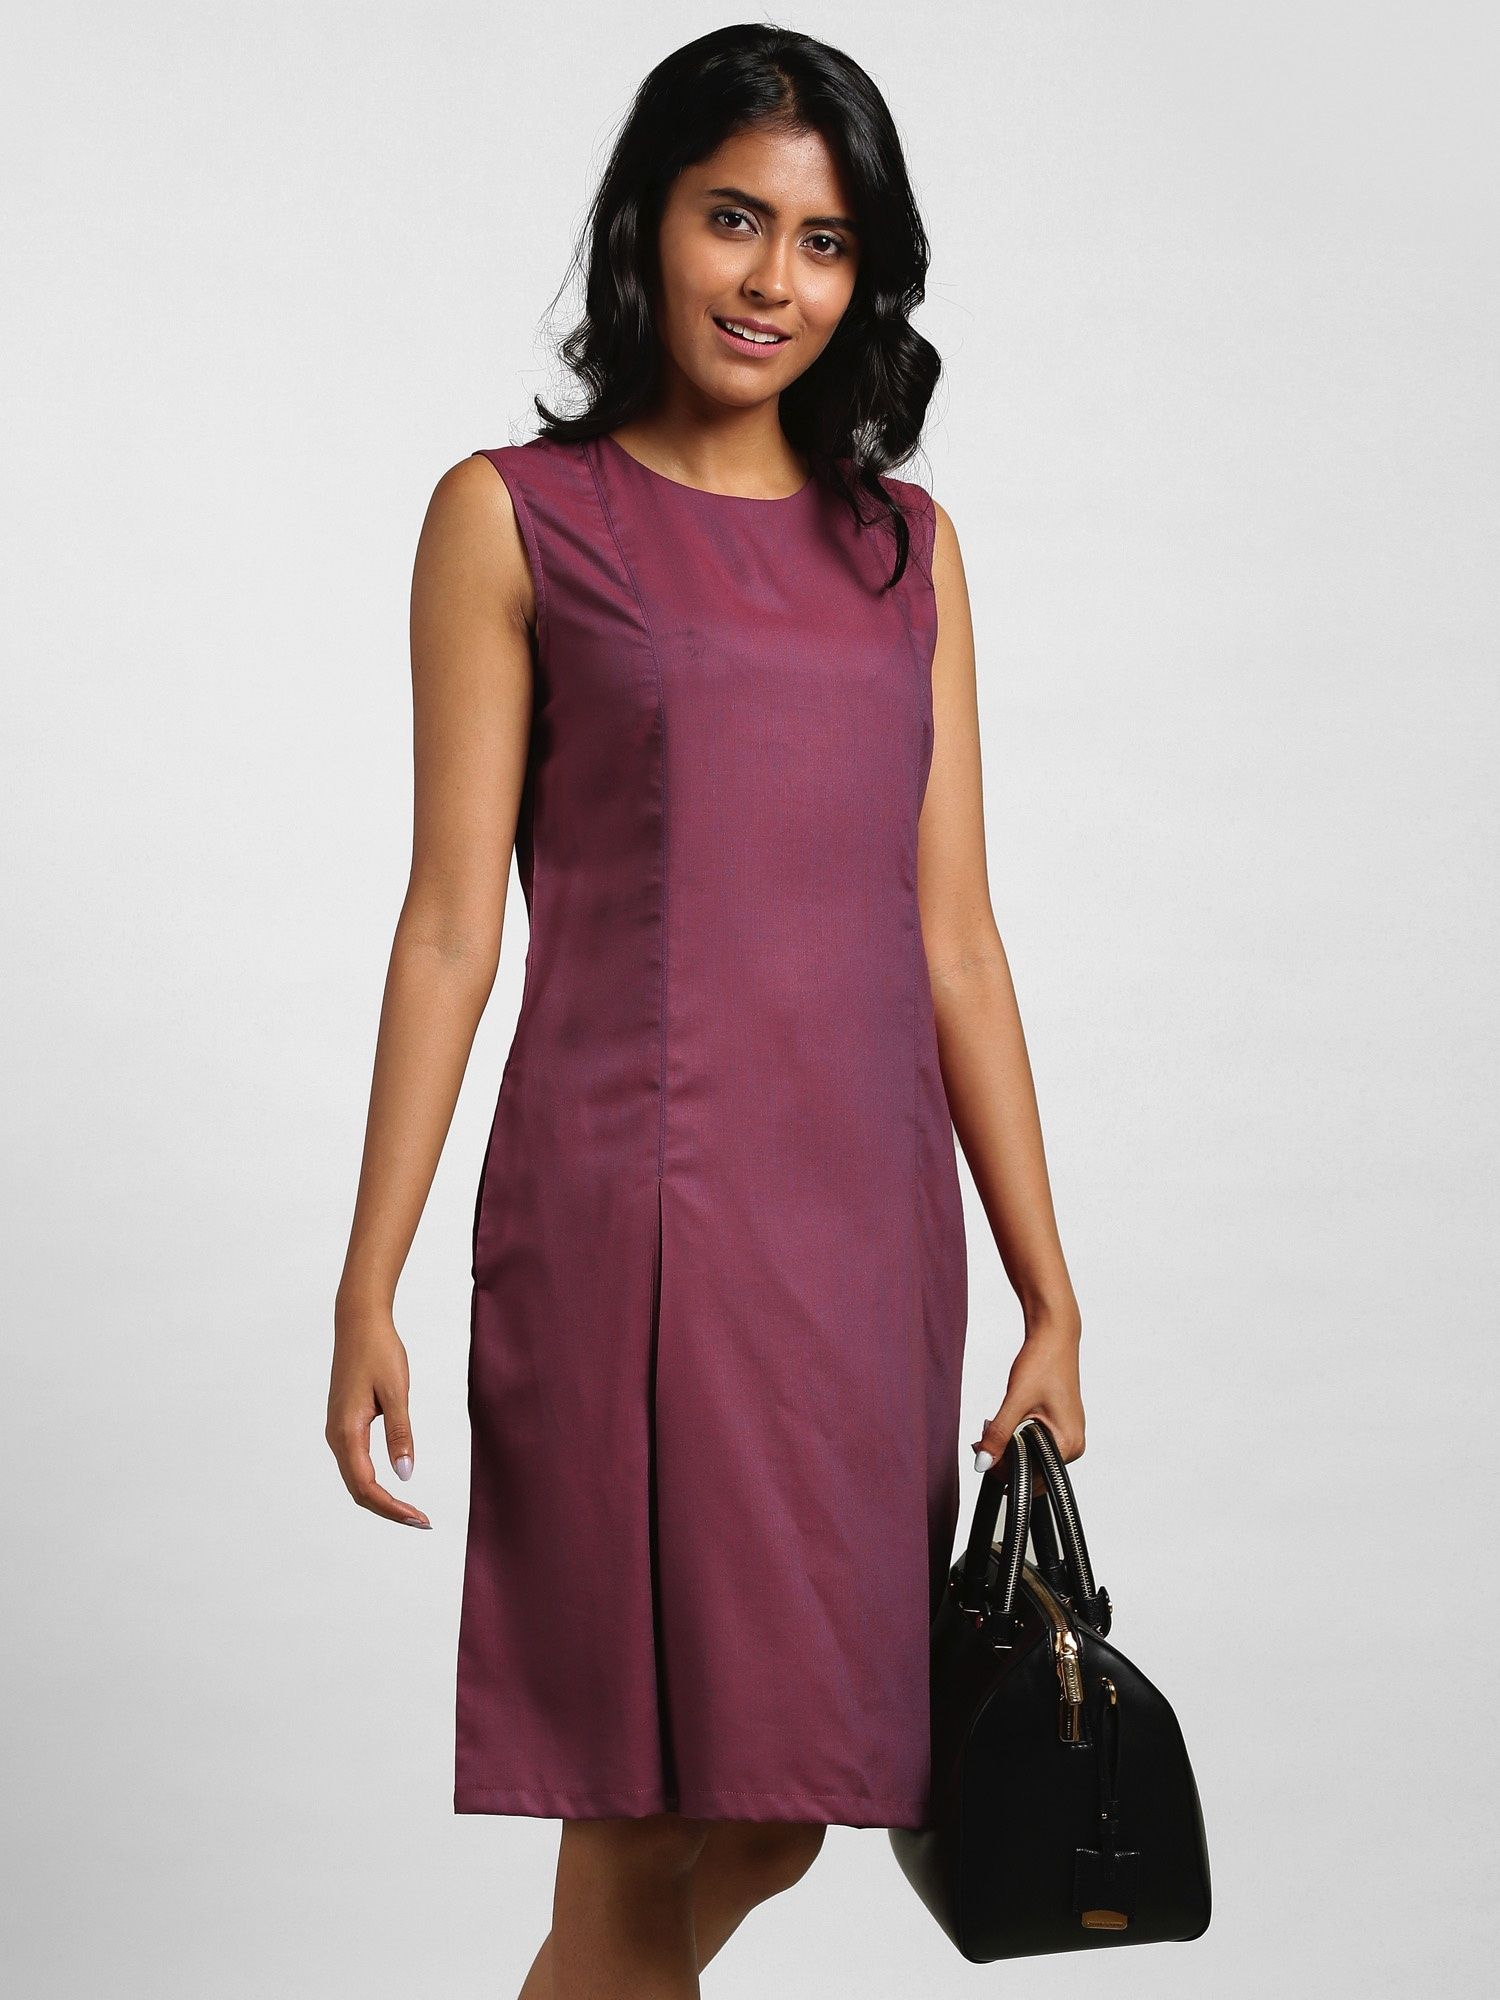 104393f32c FableStreet Dresses   Buy FableStreet Round Neck Wide Box Pleat Dress -  Purple Online